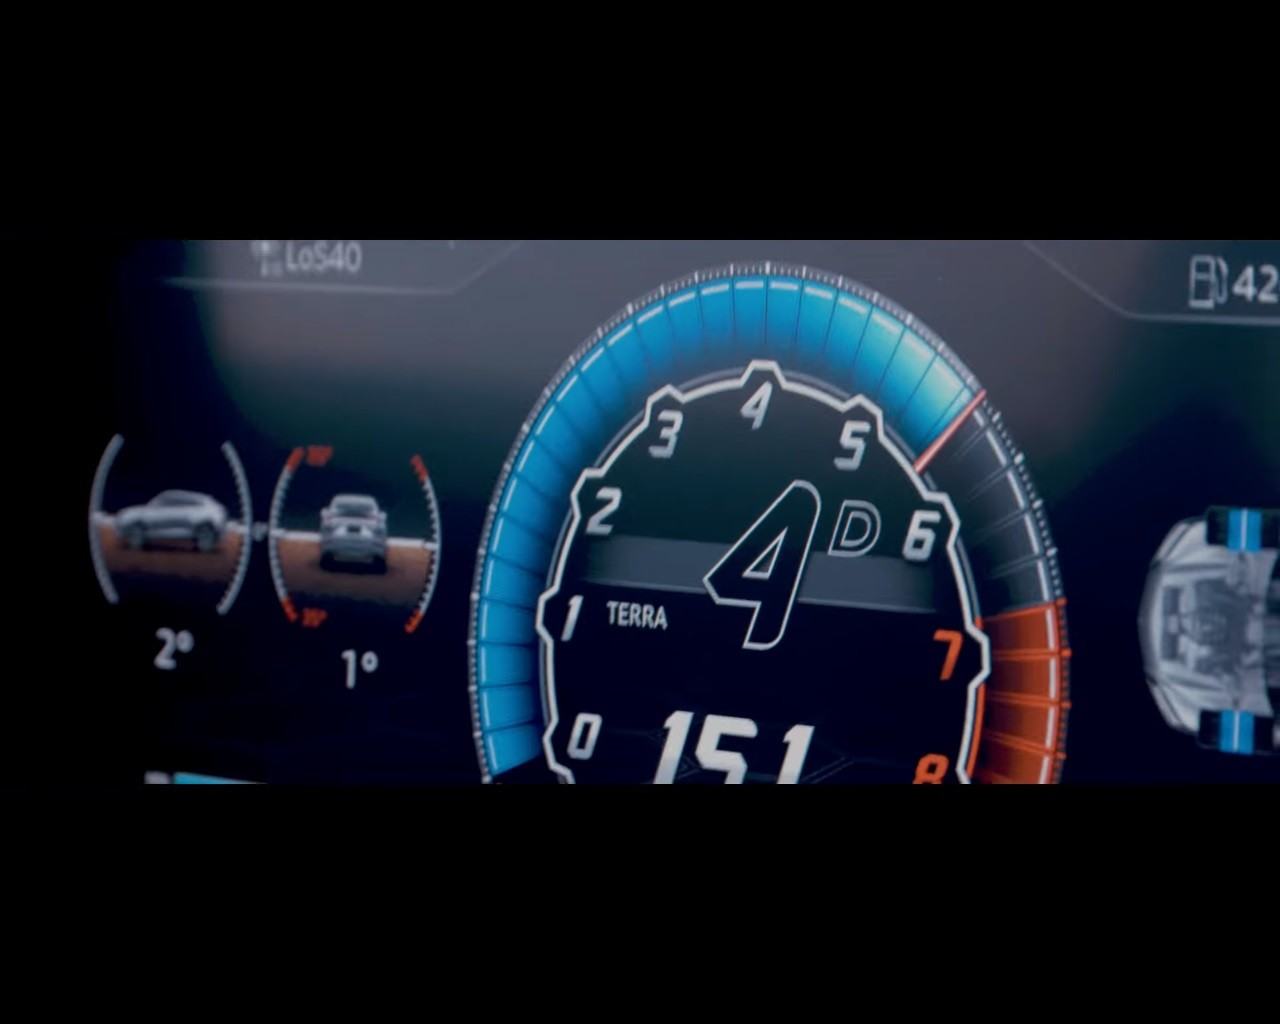 lamborghini veneno speedometer. 2018 lamborghini urus virtual cockpit in terra driving mode veneno speedometer 3